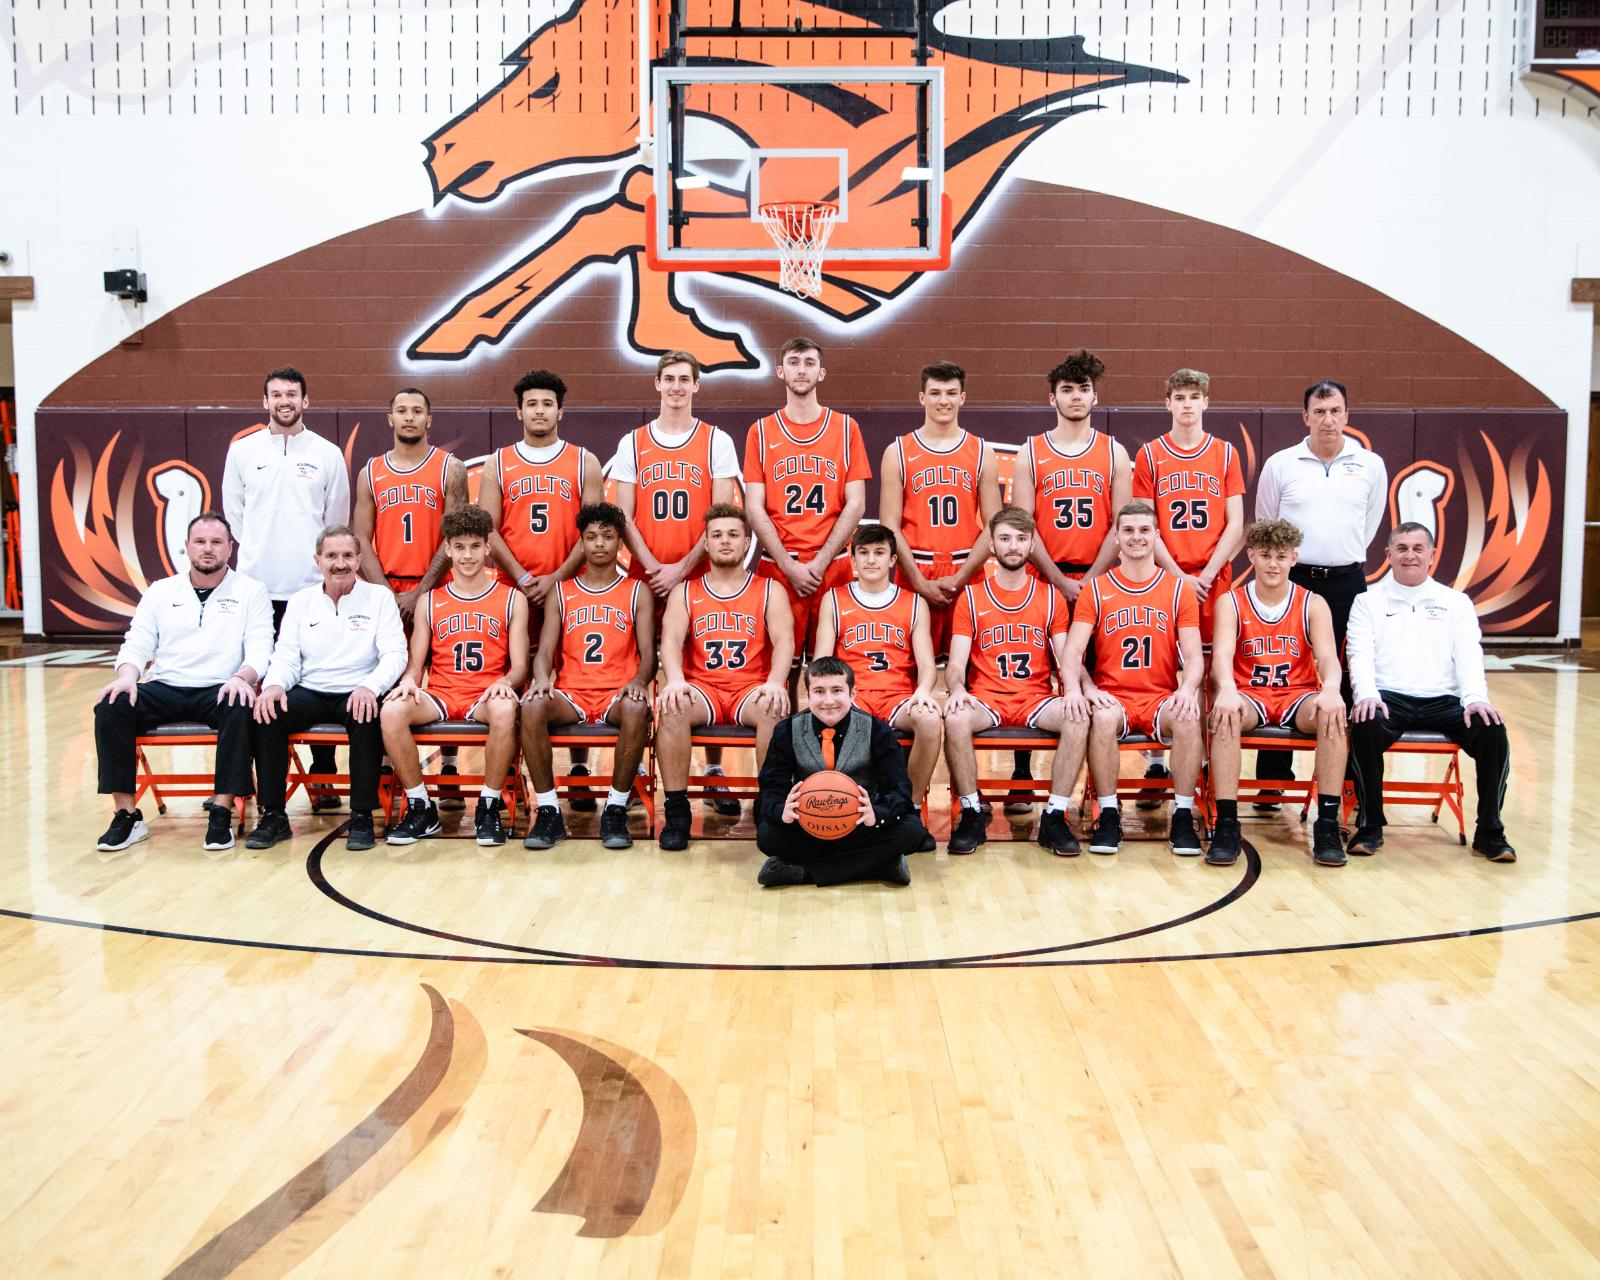 Div. II Boys Basketball Sectional Tournament Pre-sale Information